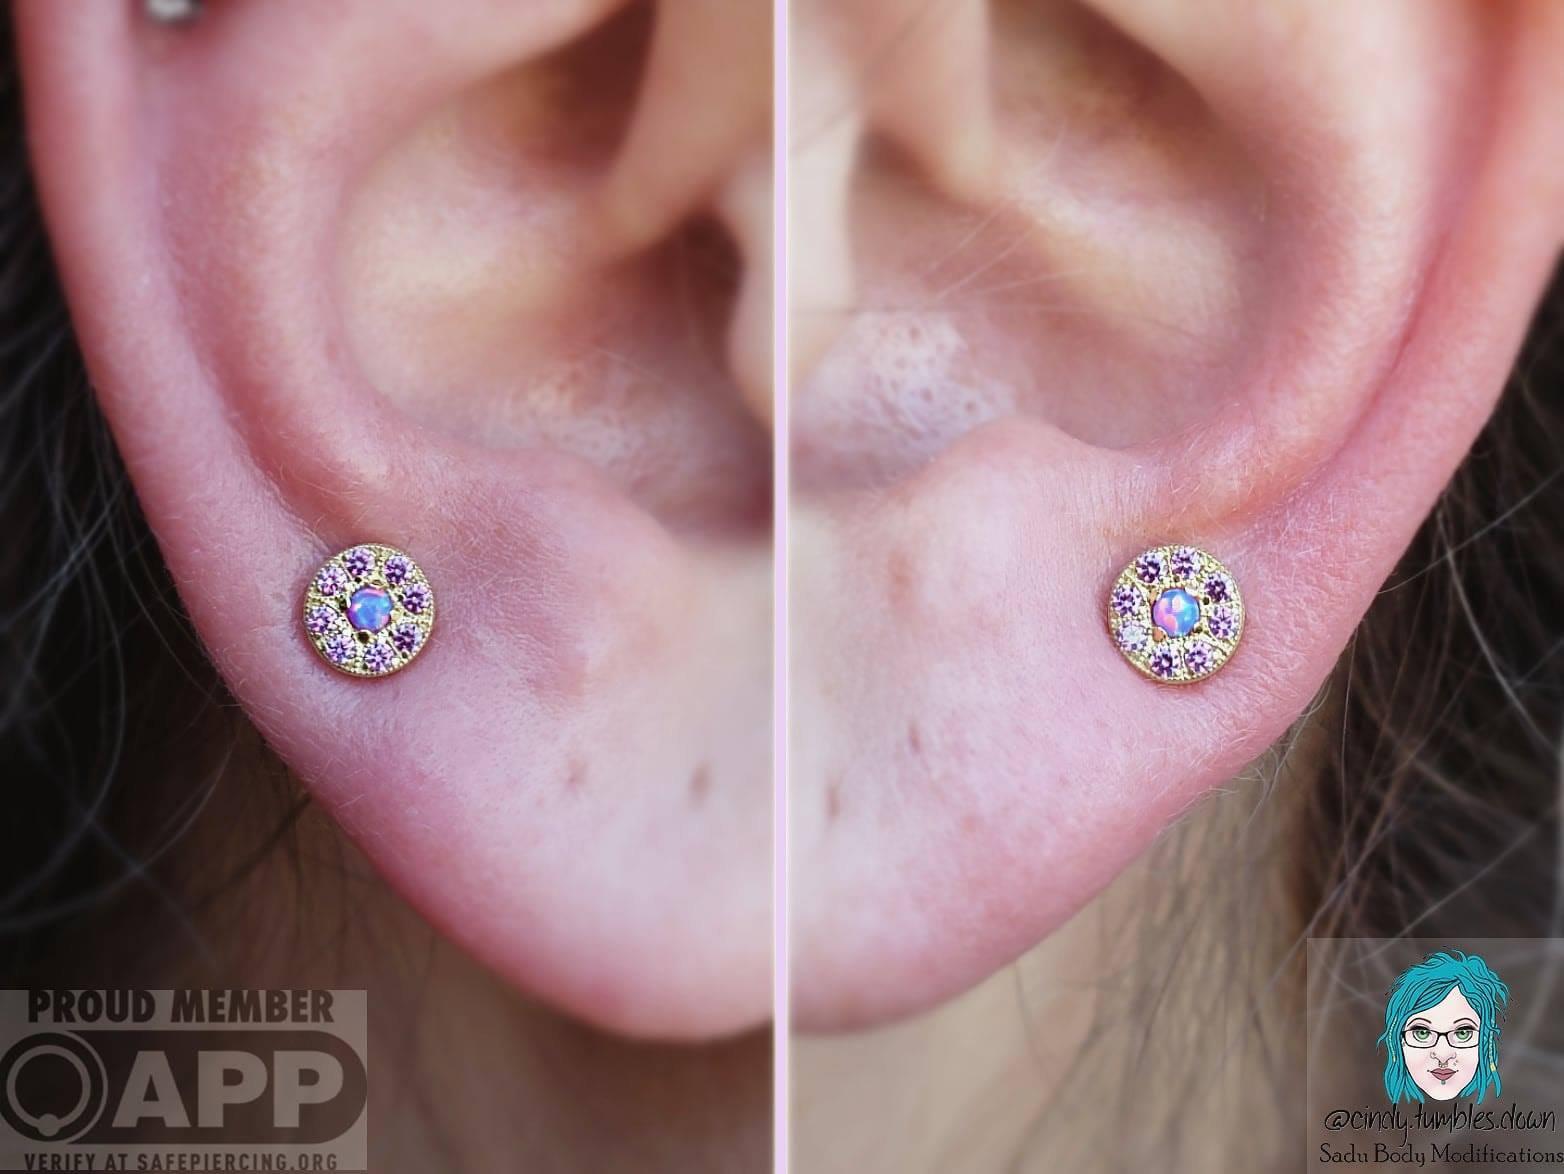 Pair of Lobe Piercing (ages 10+)